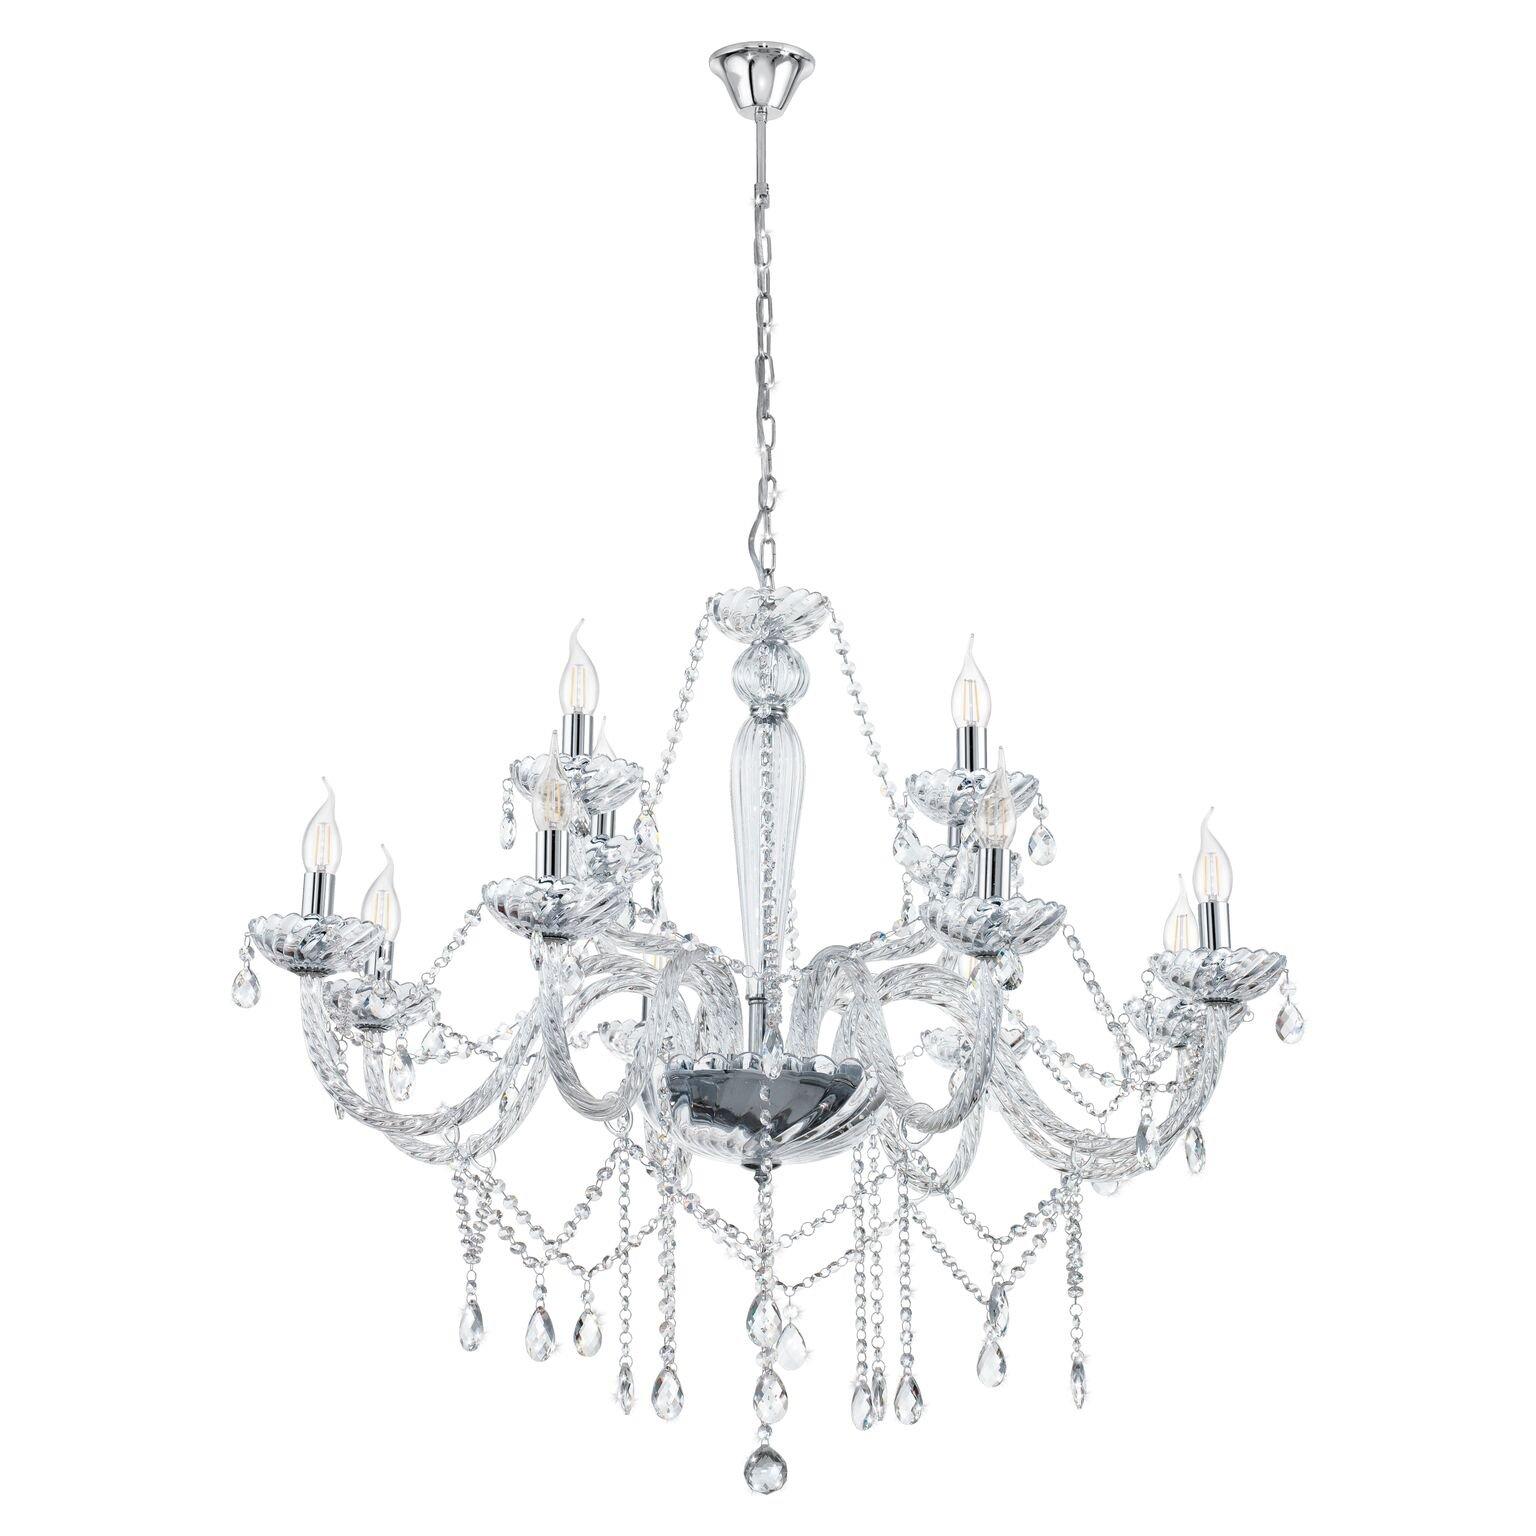 basilano 12 lights chandeliers